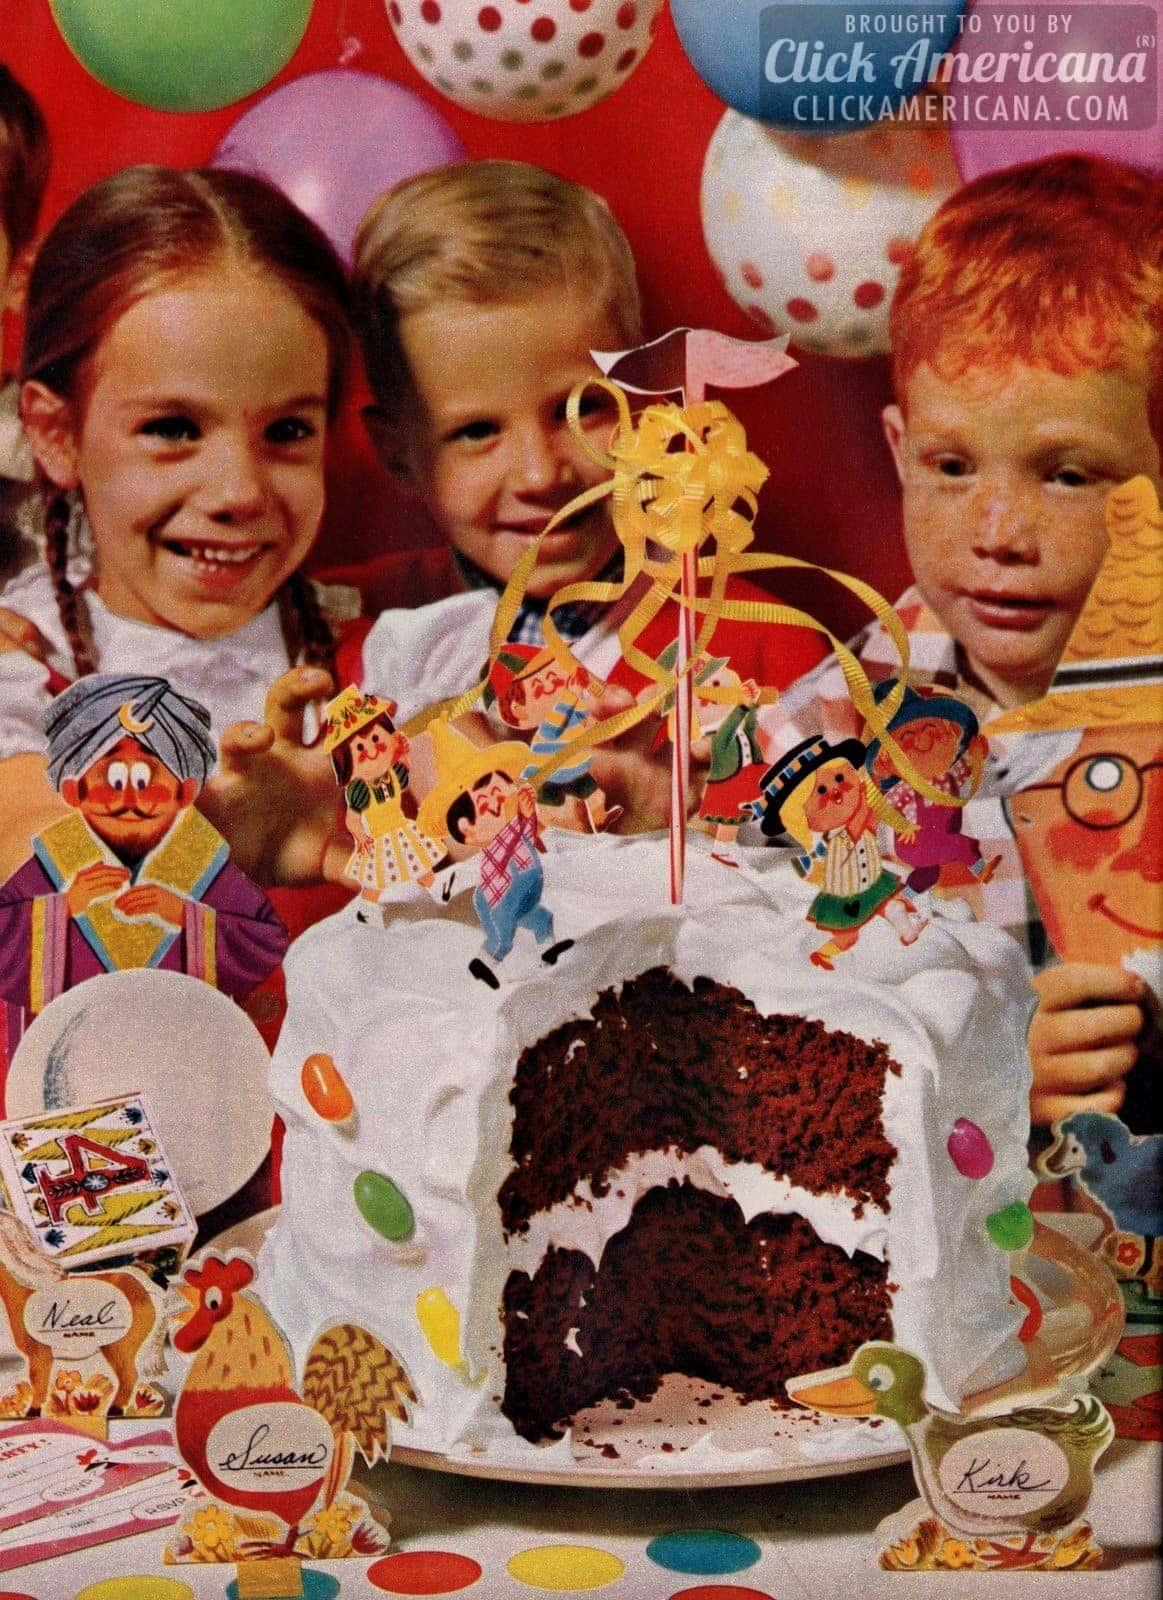 Make A County Fair Party Cake 1962 Click Americana